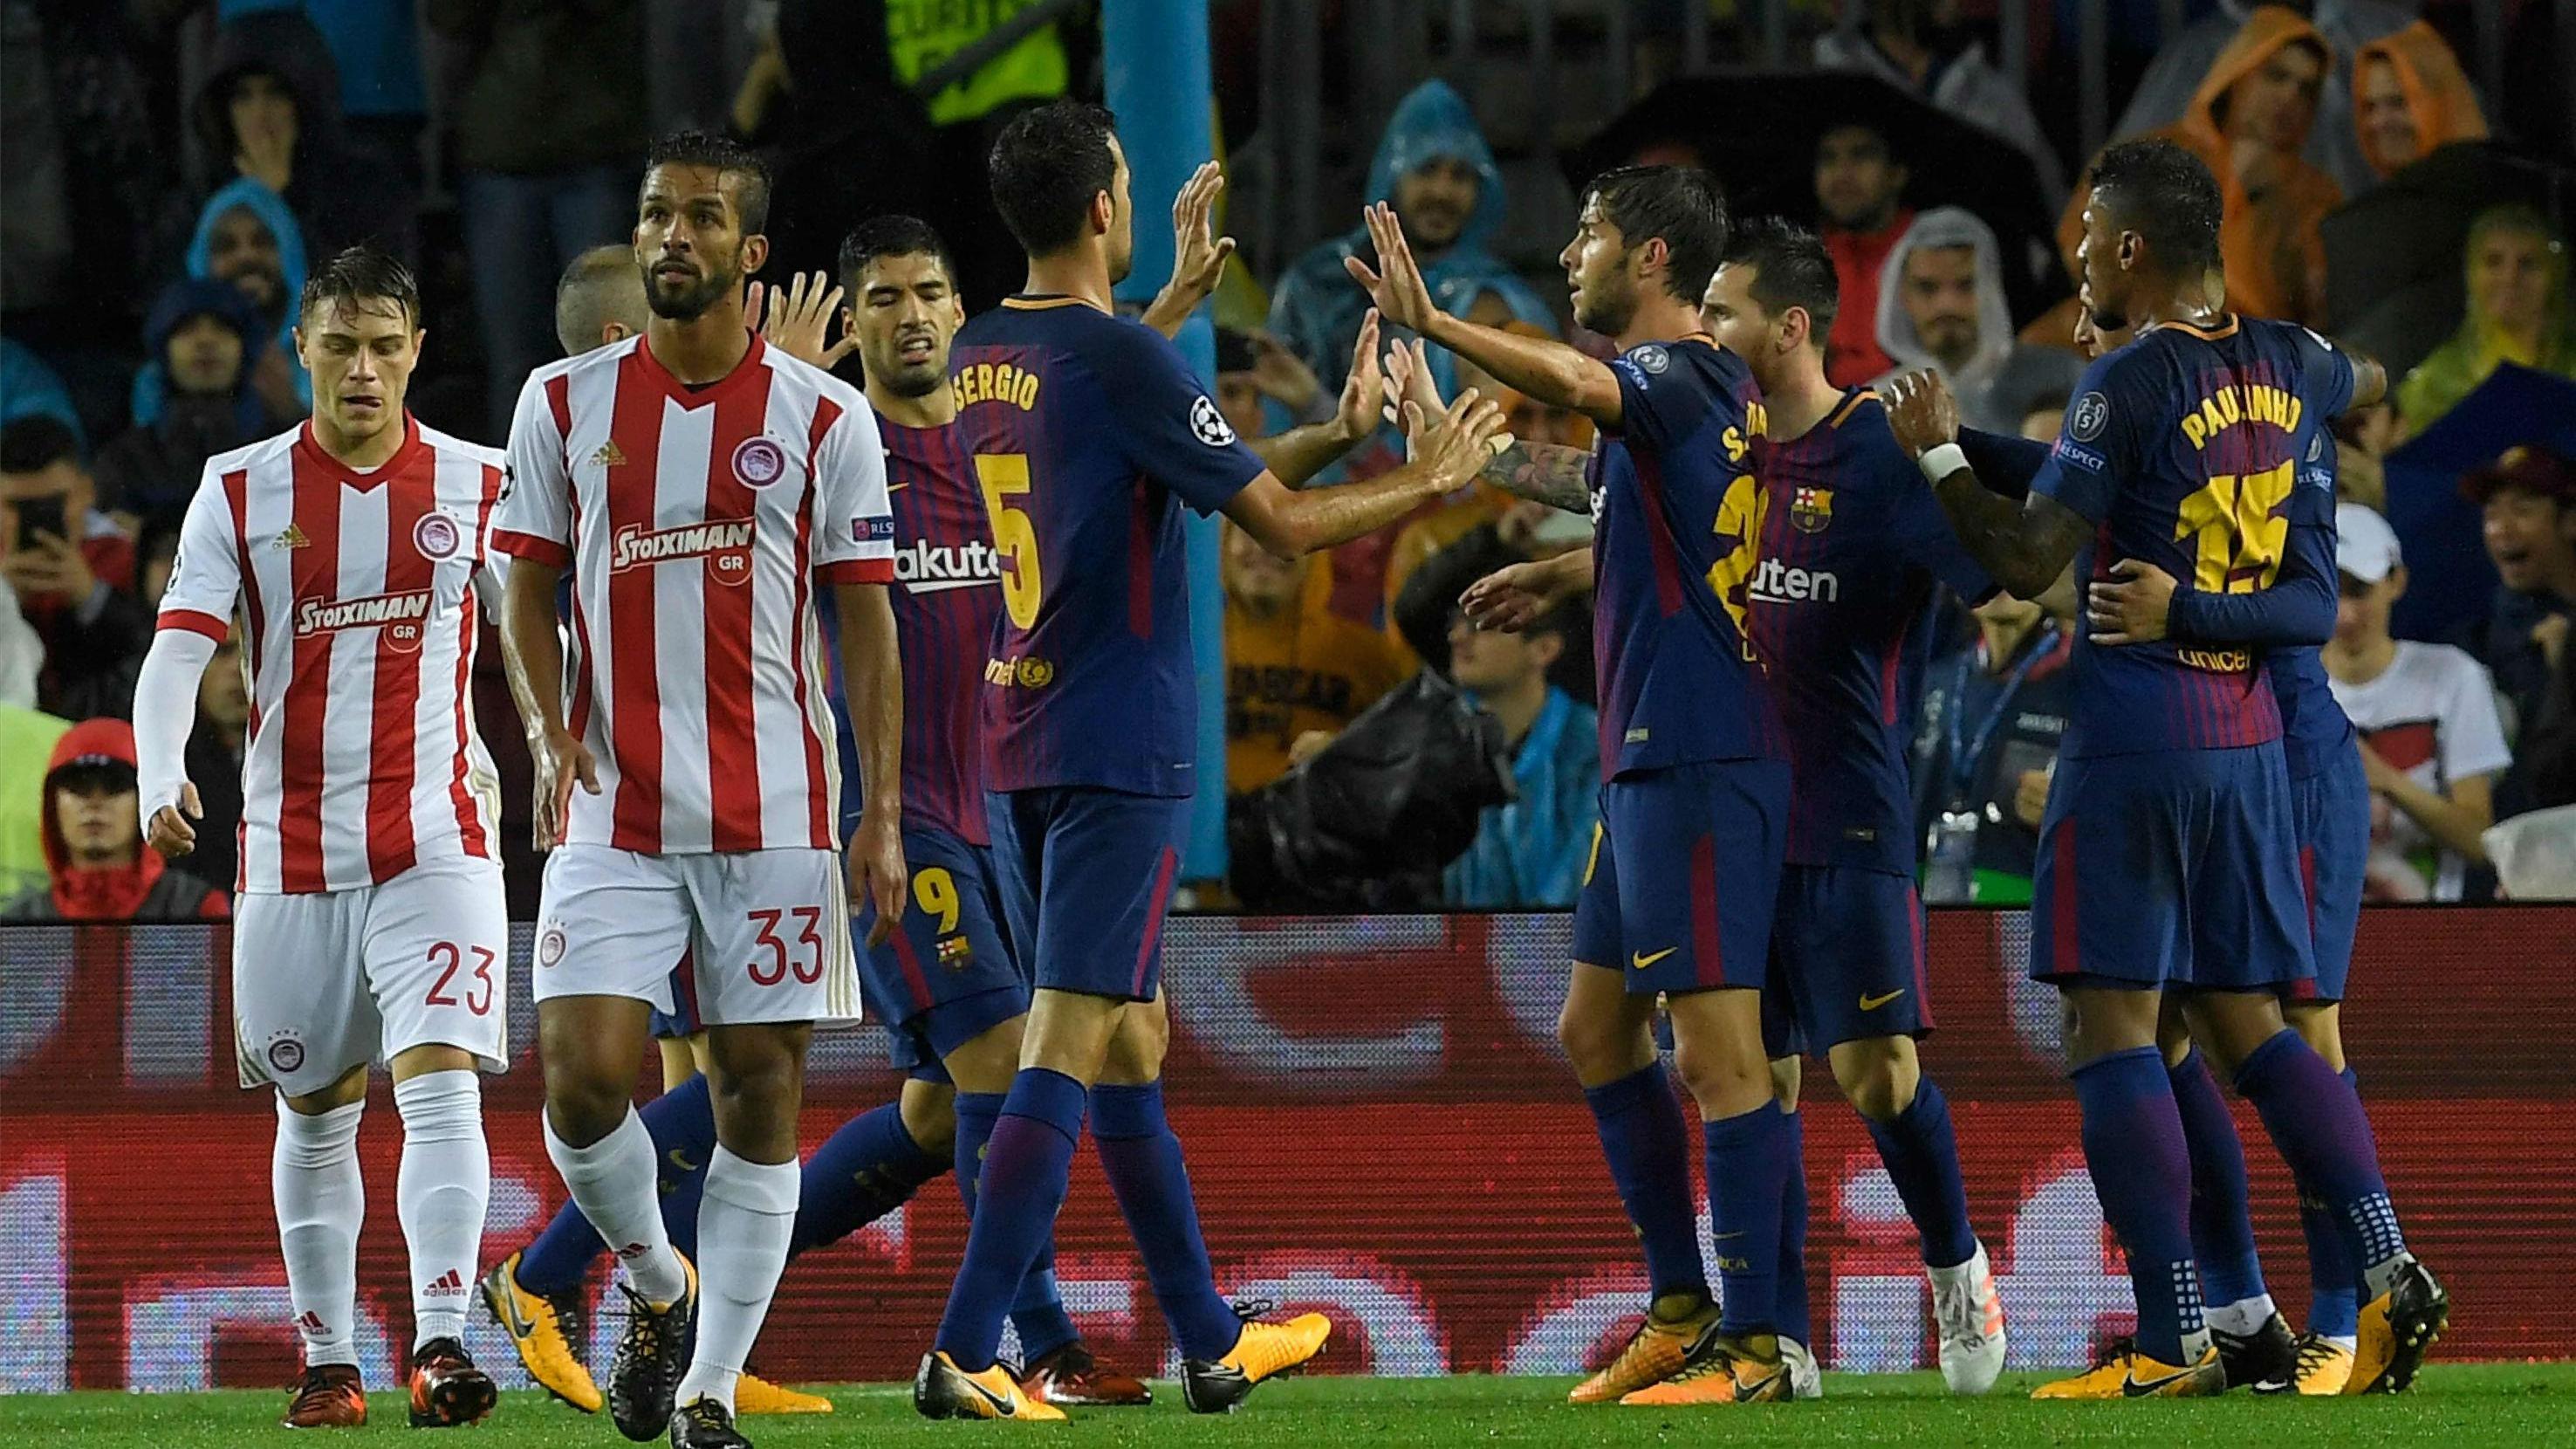 LACHAMPIONS | FC Barcelona - Olympiacos (3-1): El gol en propia puerta de Nikolau